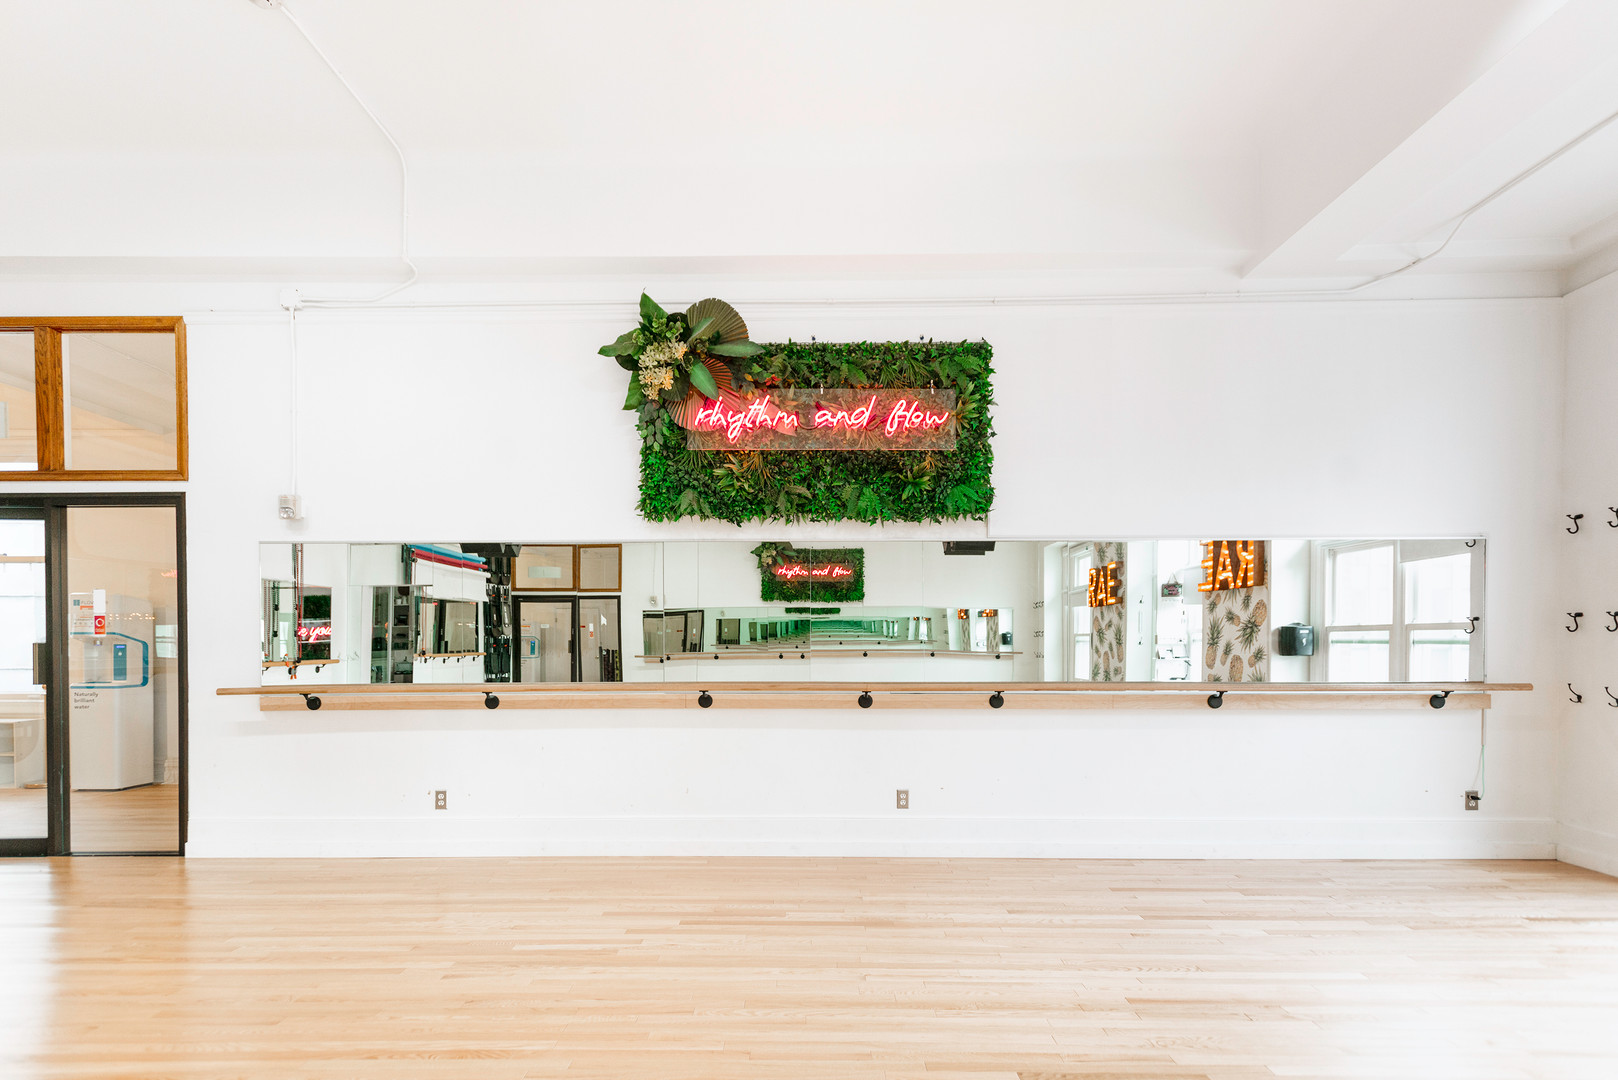 Rae Studios Dance Studio with bright natural window light San Francisco Bay Area